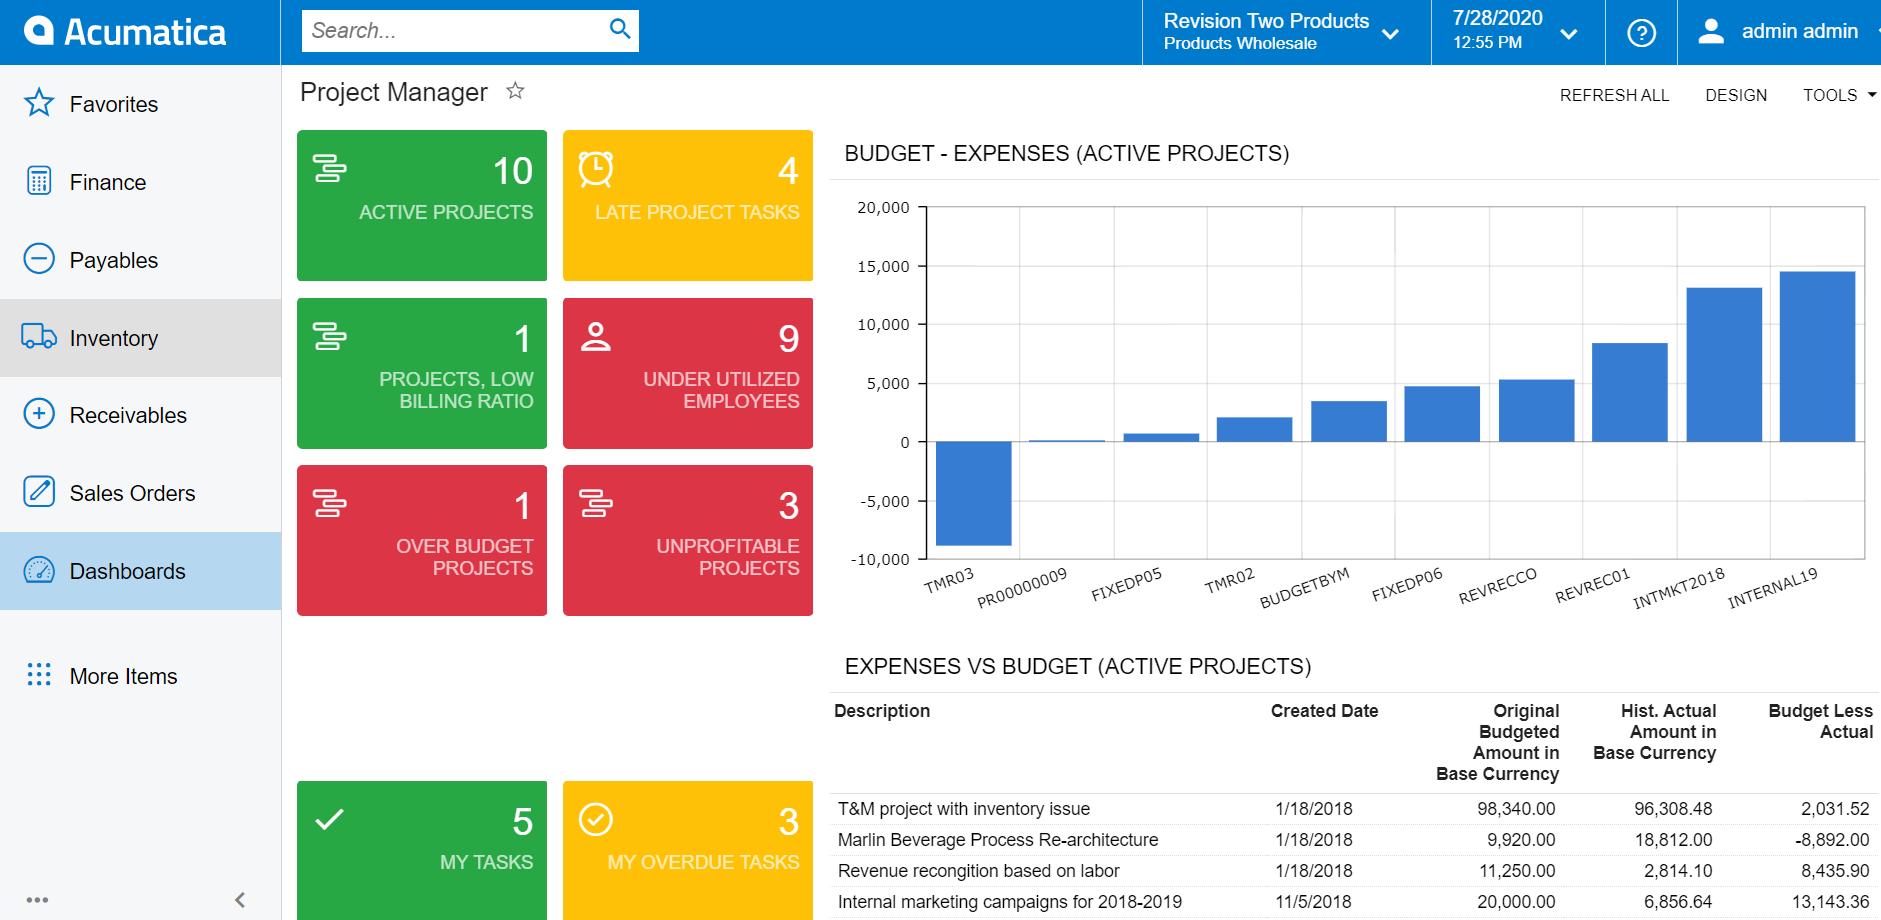 Acumatica Cloud ERP Software - 3